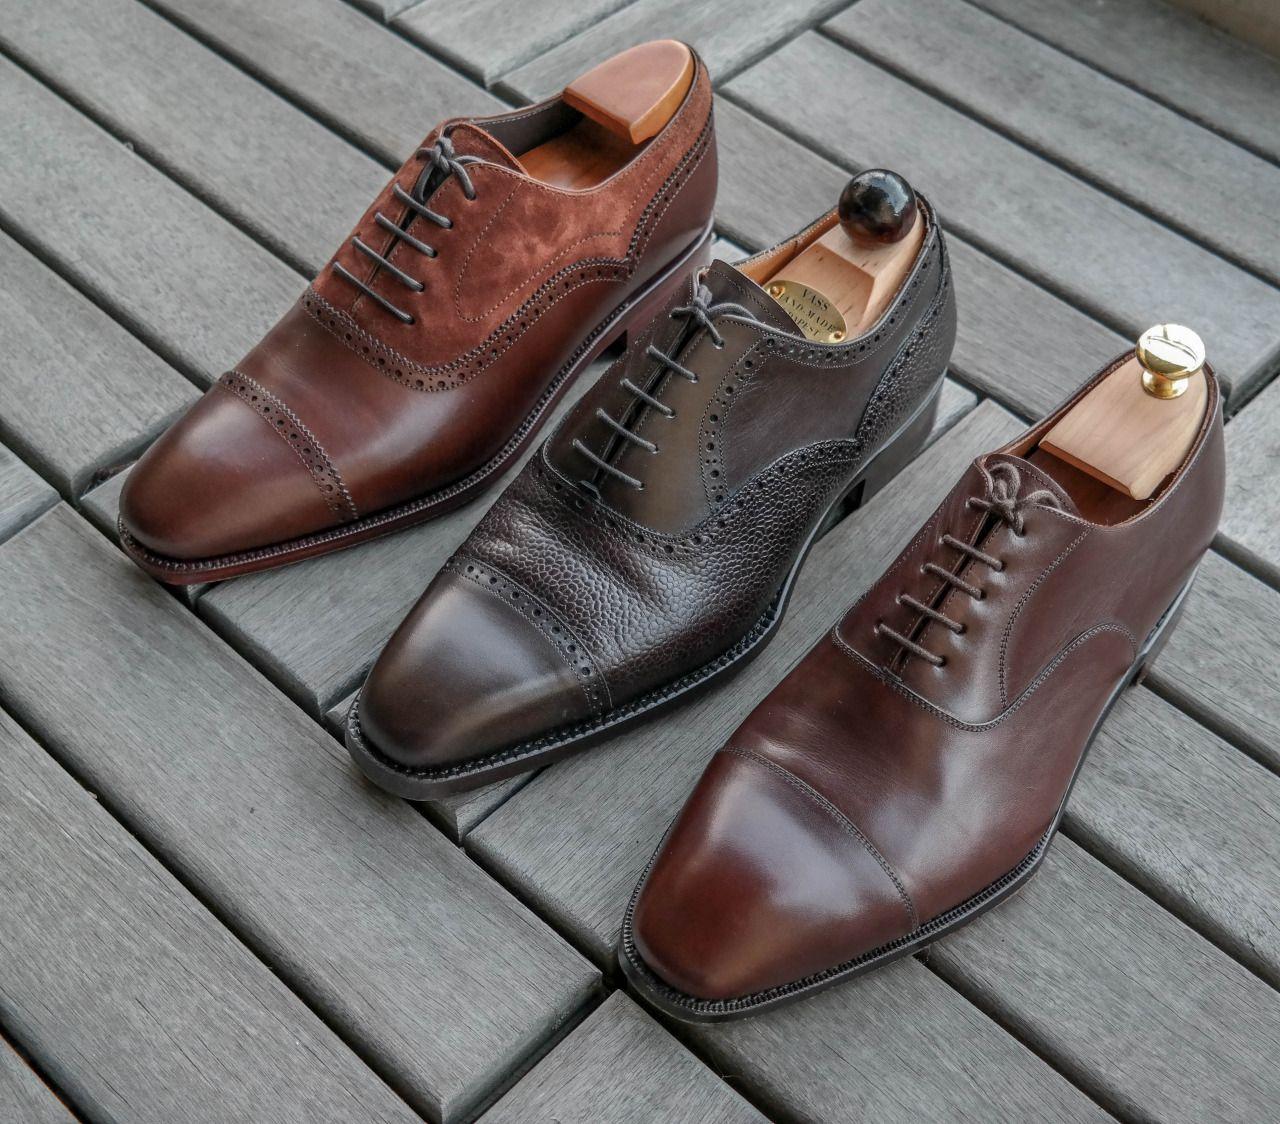 bcc98f56085 Dandy Shoe Care